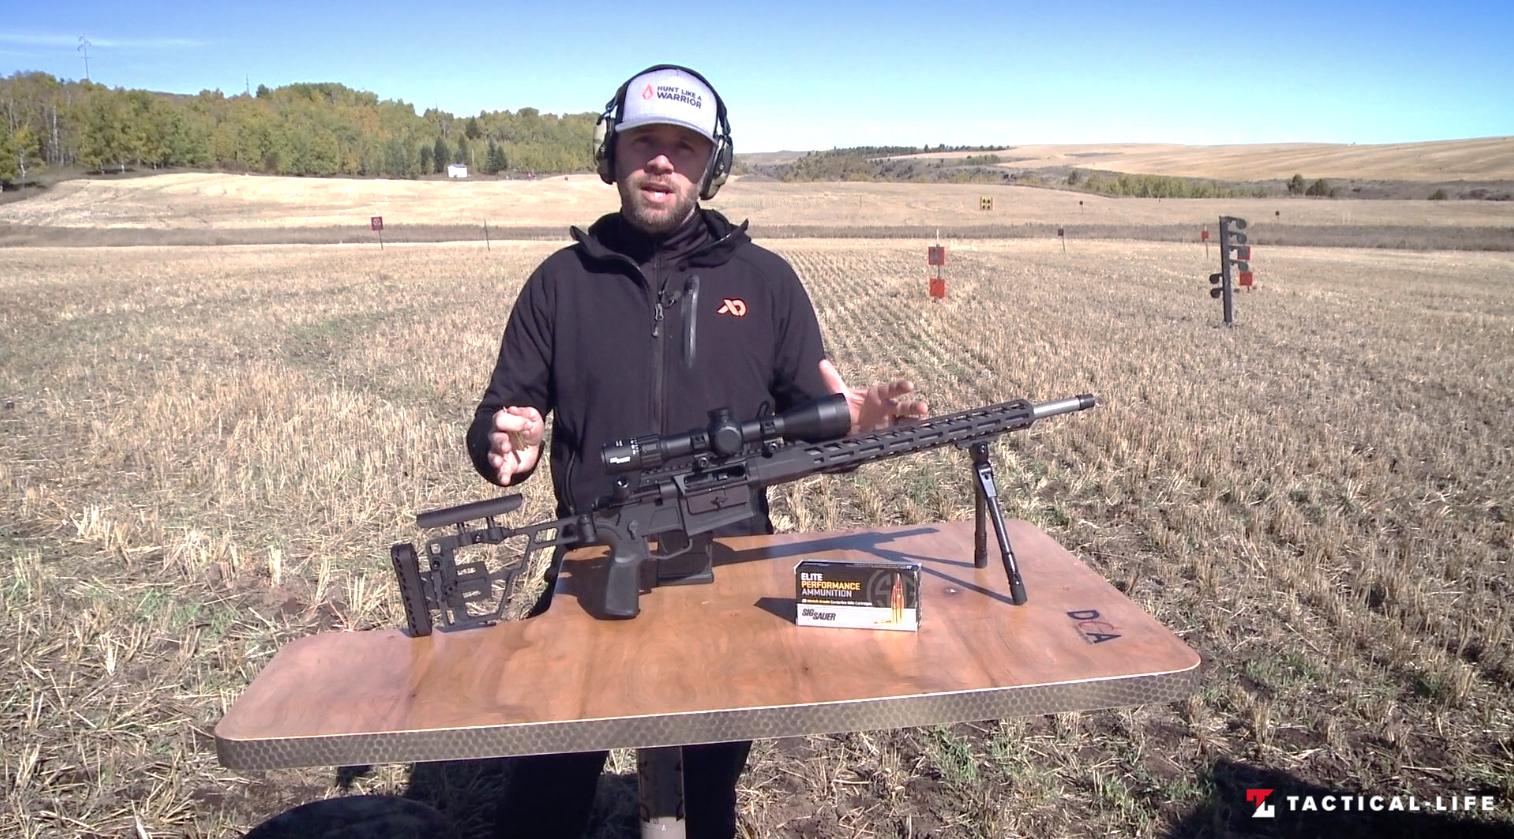 SIG Sauer Cross Bolt Action Rifle, SIG Cross Bolt Action Rifle, test